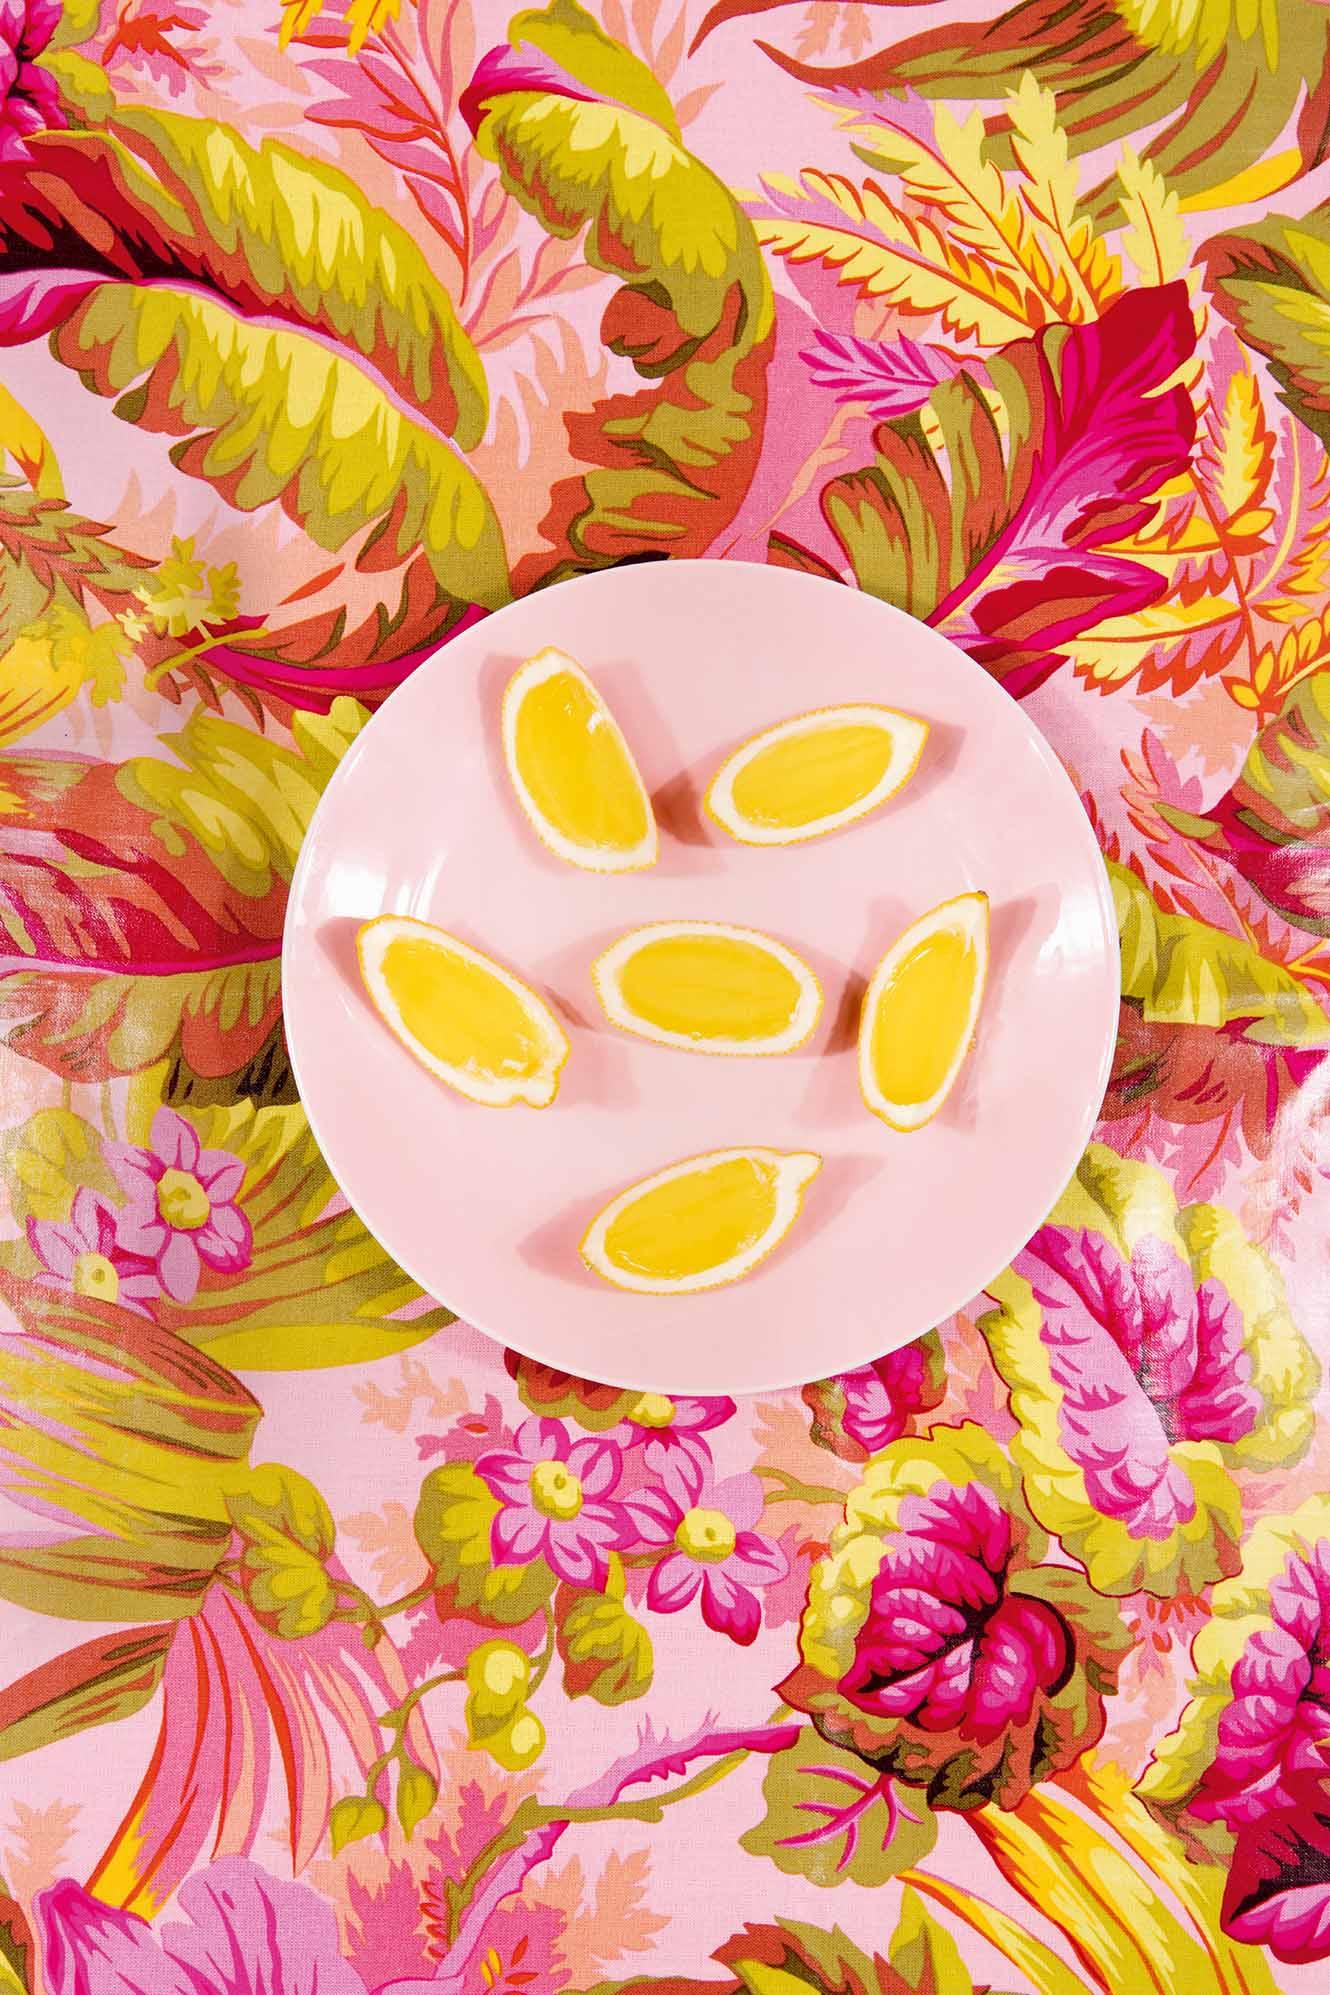 AY006_food_jelloZitronen_RGB.jpg